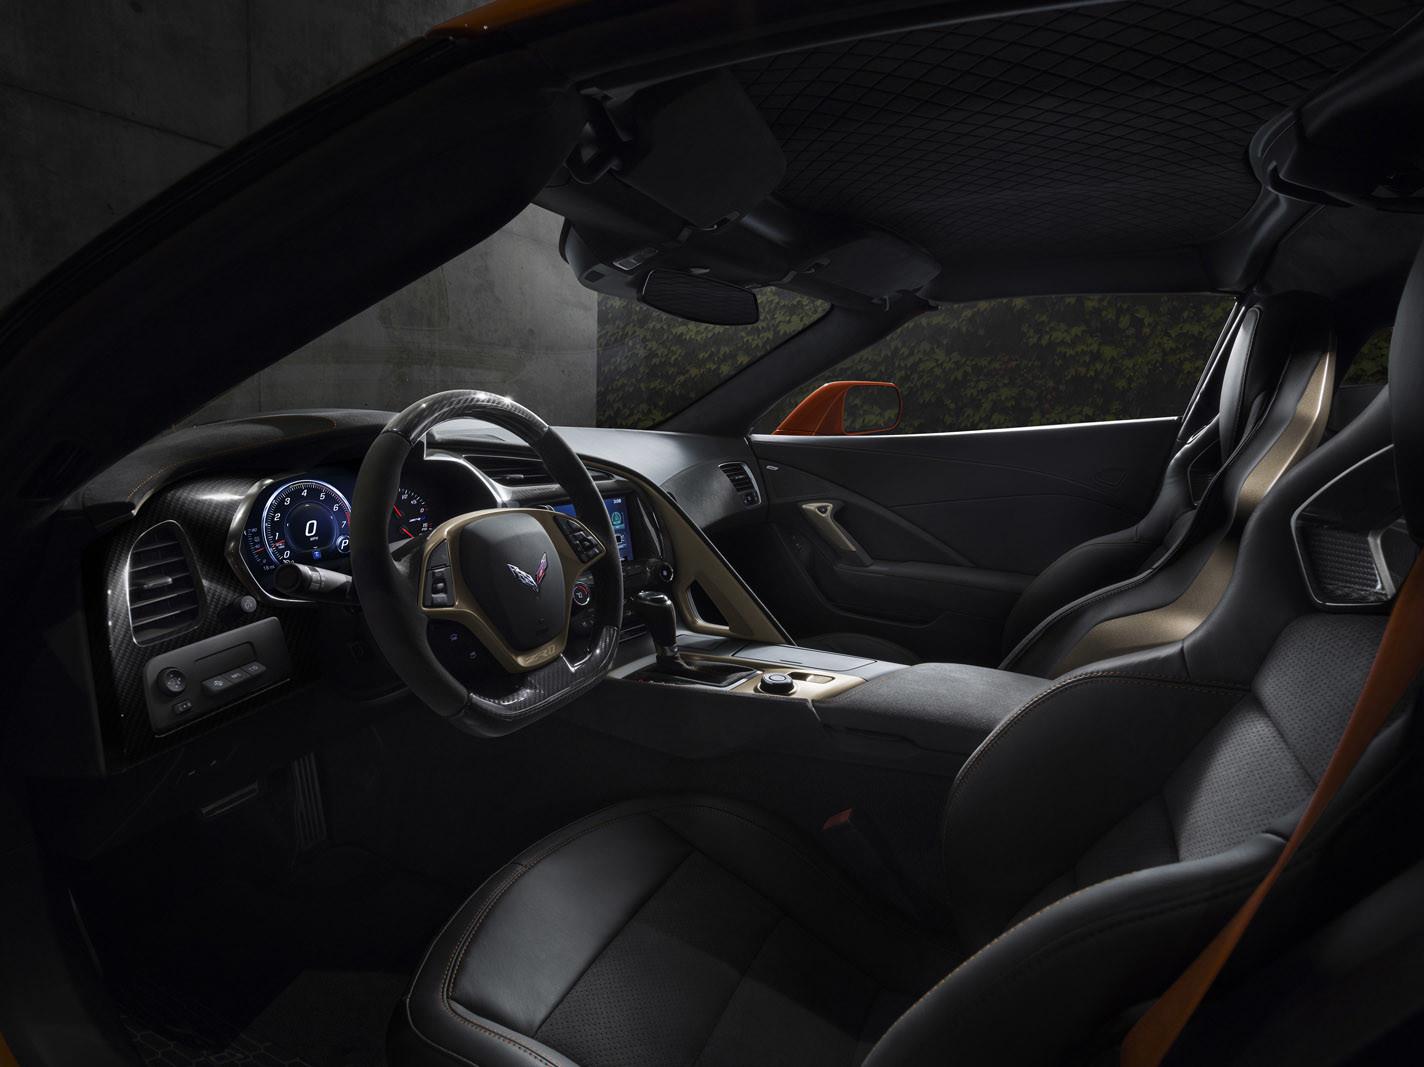 chevrolet-corvette-zr1-interior